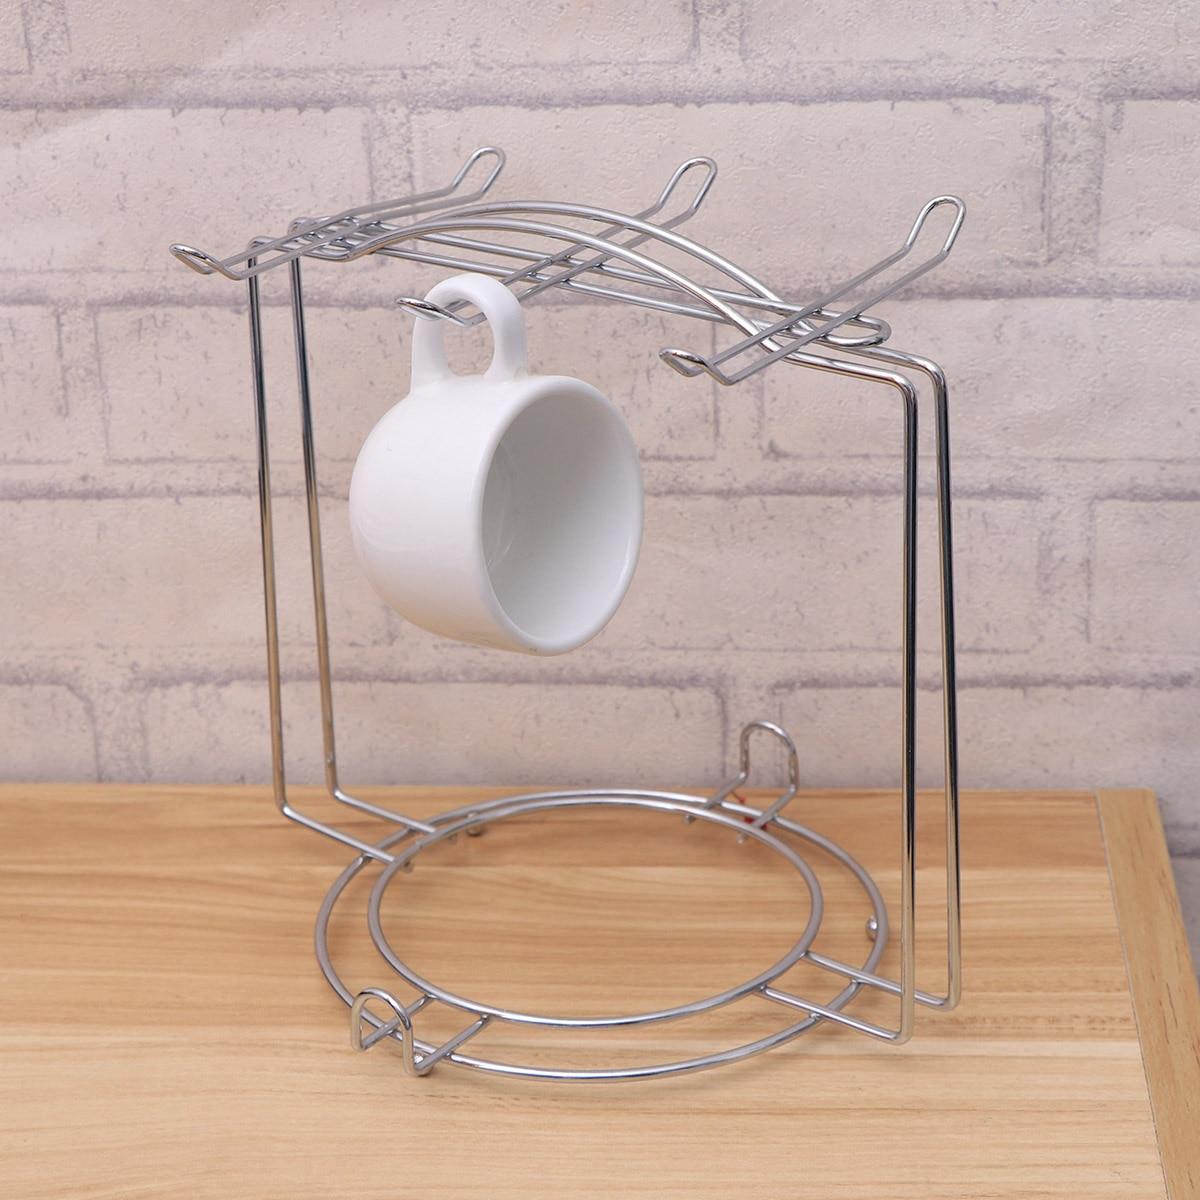 Cup Plate Storage Rack Houseware Shelf Mug Rack Coffee Cup Holder Kitchen Accessories Home Decor Organizer